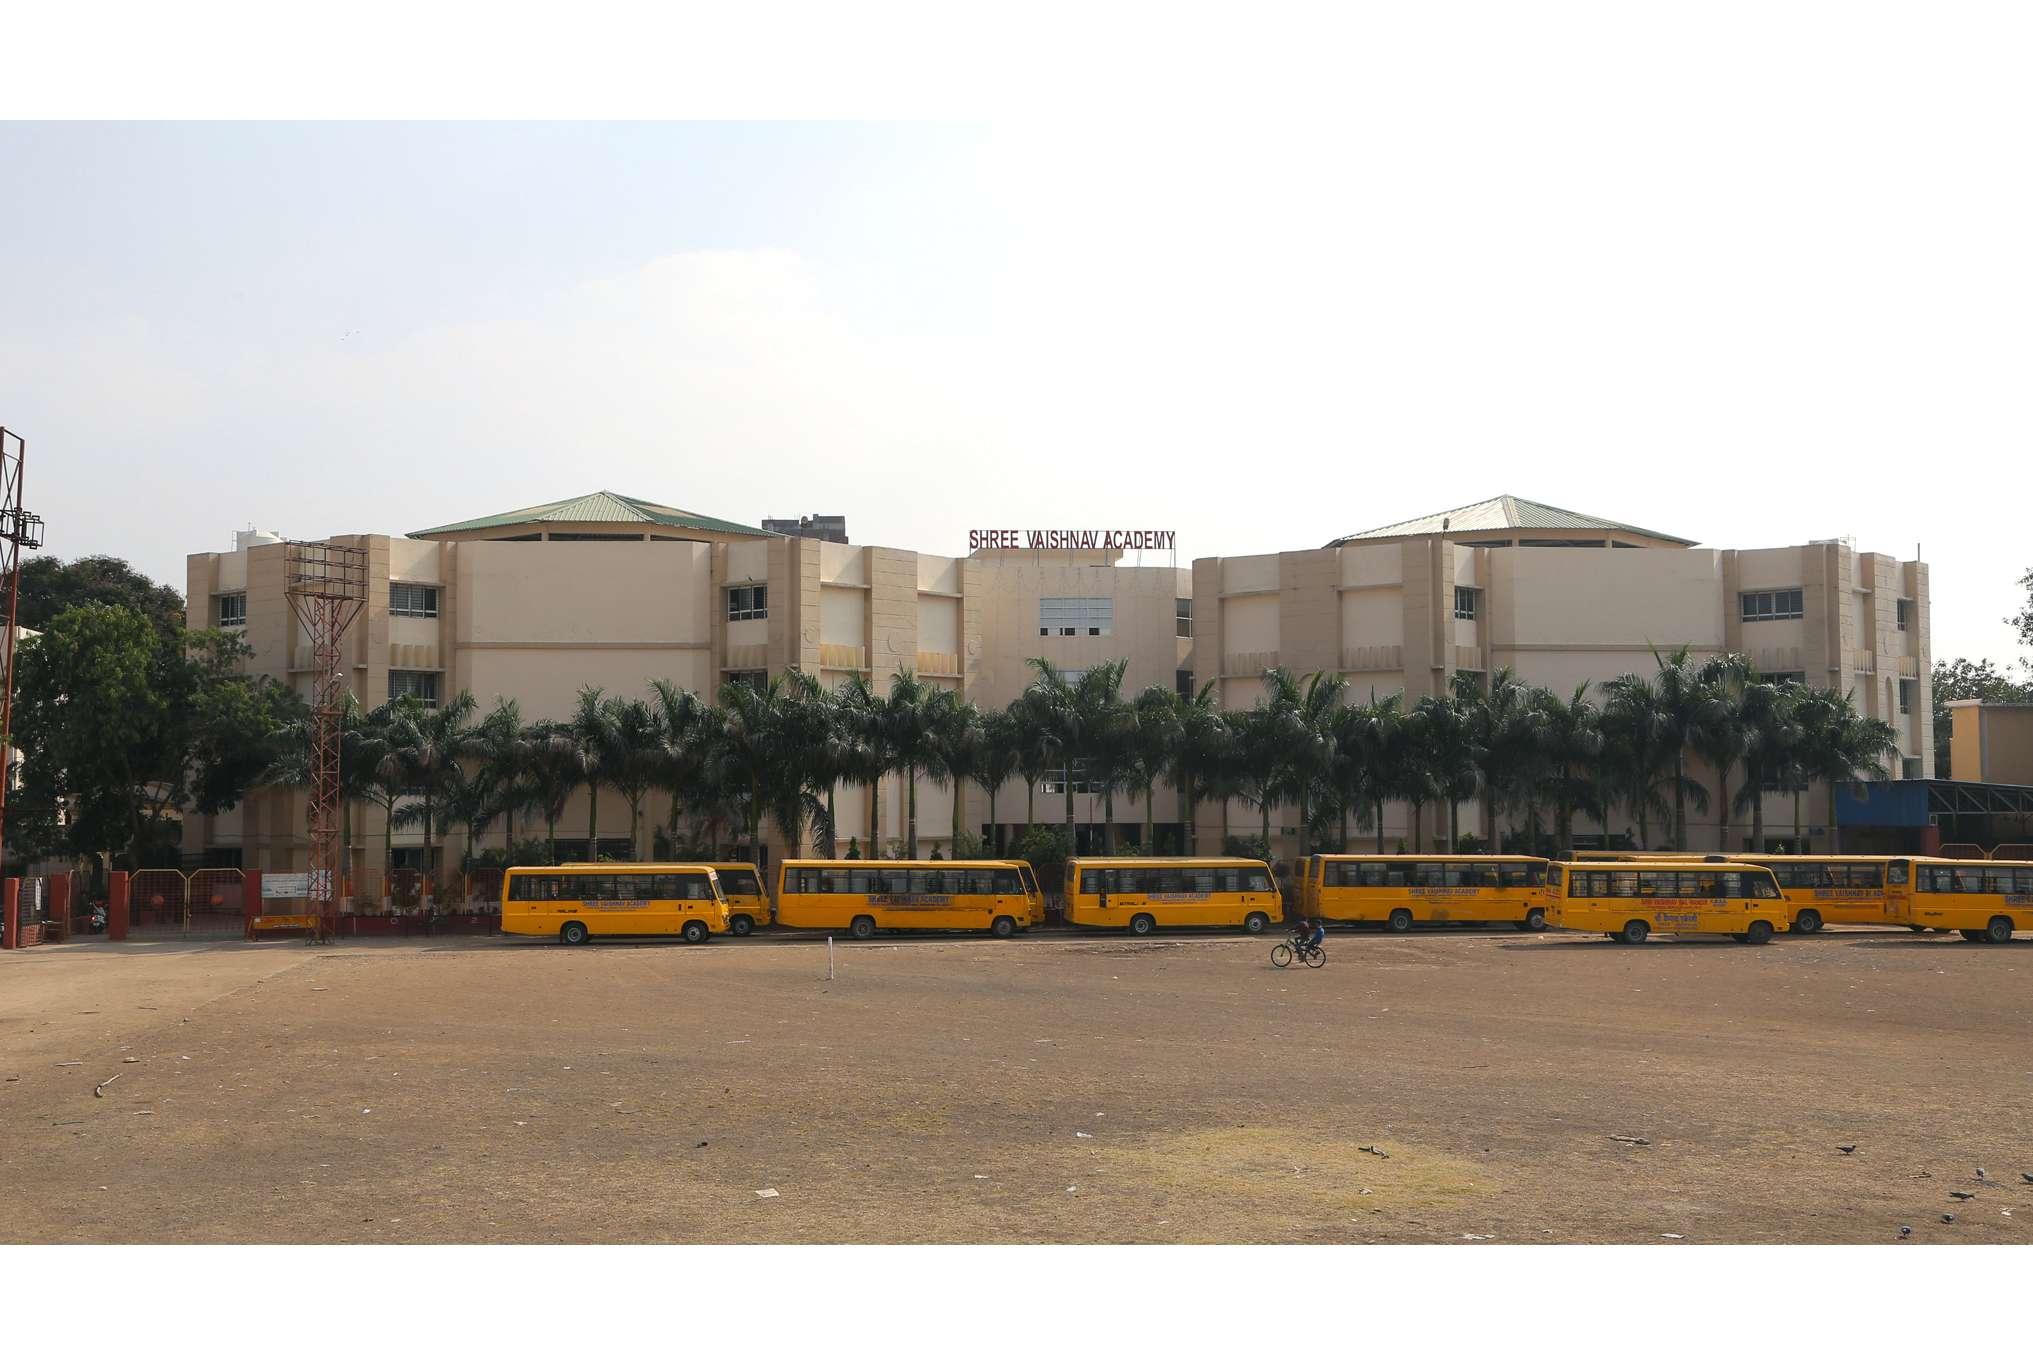 SHRI VAISHNAV ACADEMY SCHOOL 177 SOUTH RAJ MOHALLA INDORE MP 1030233